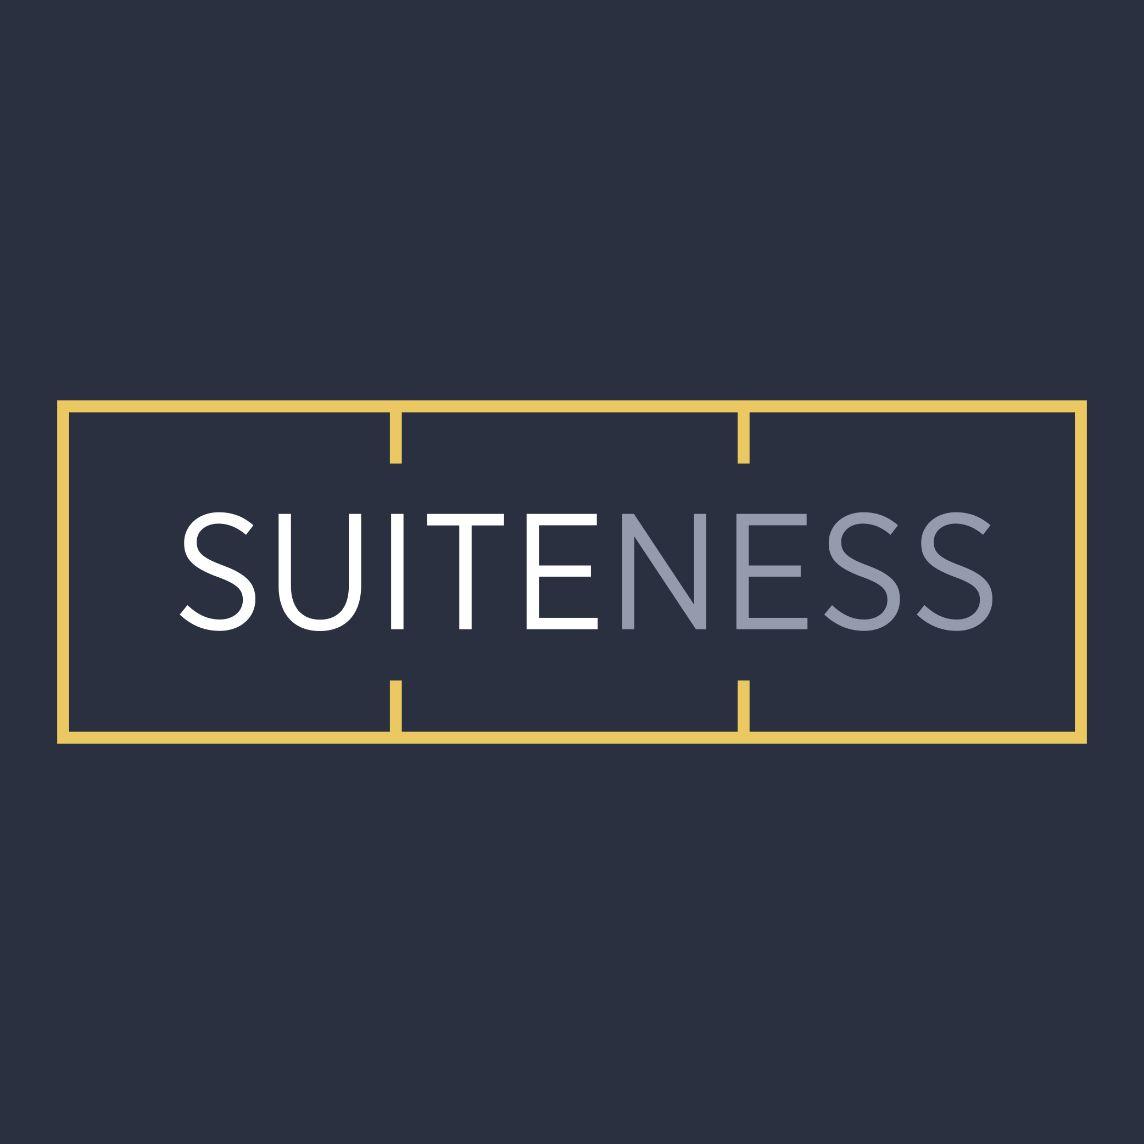 Suiteness